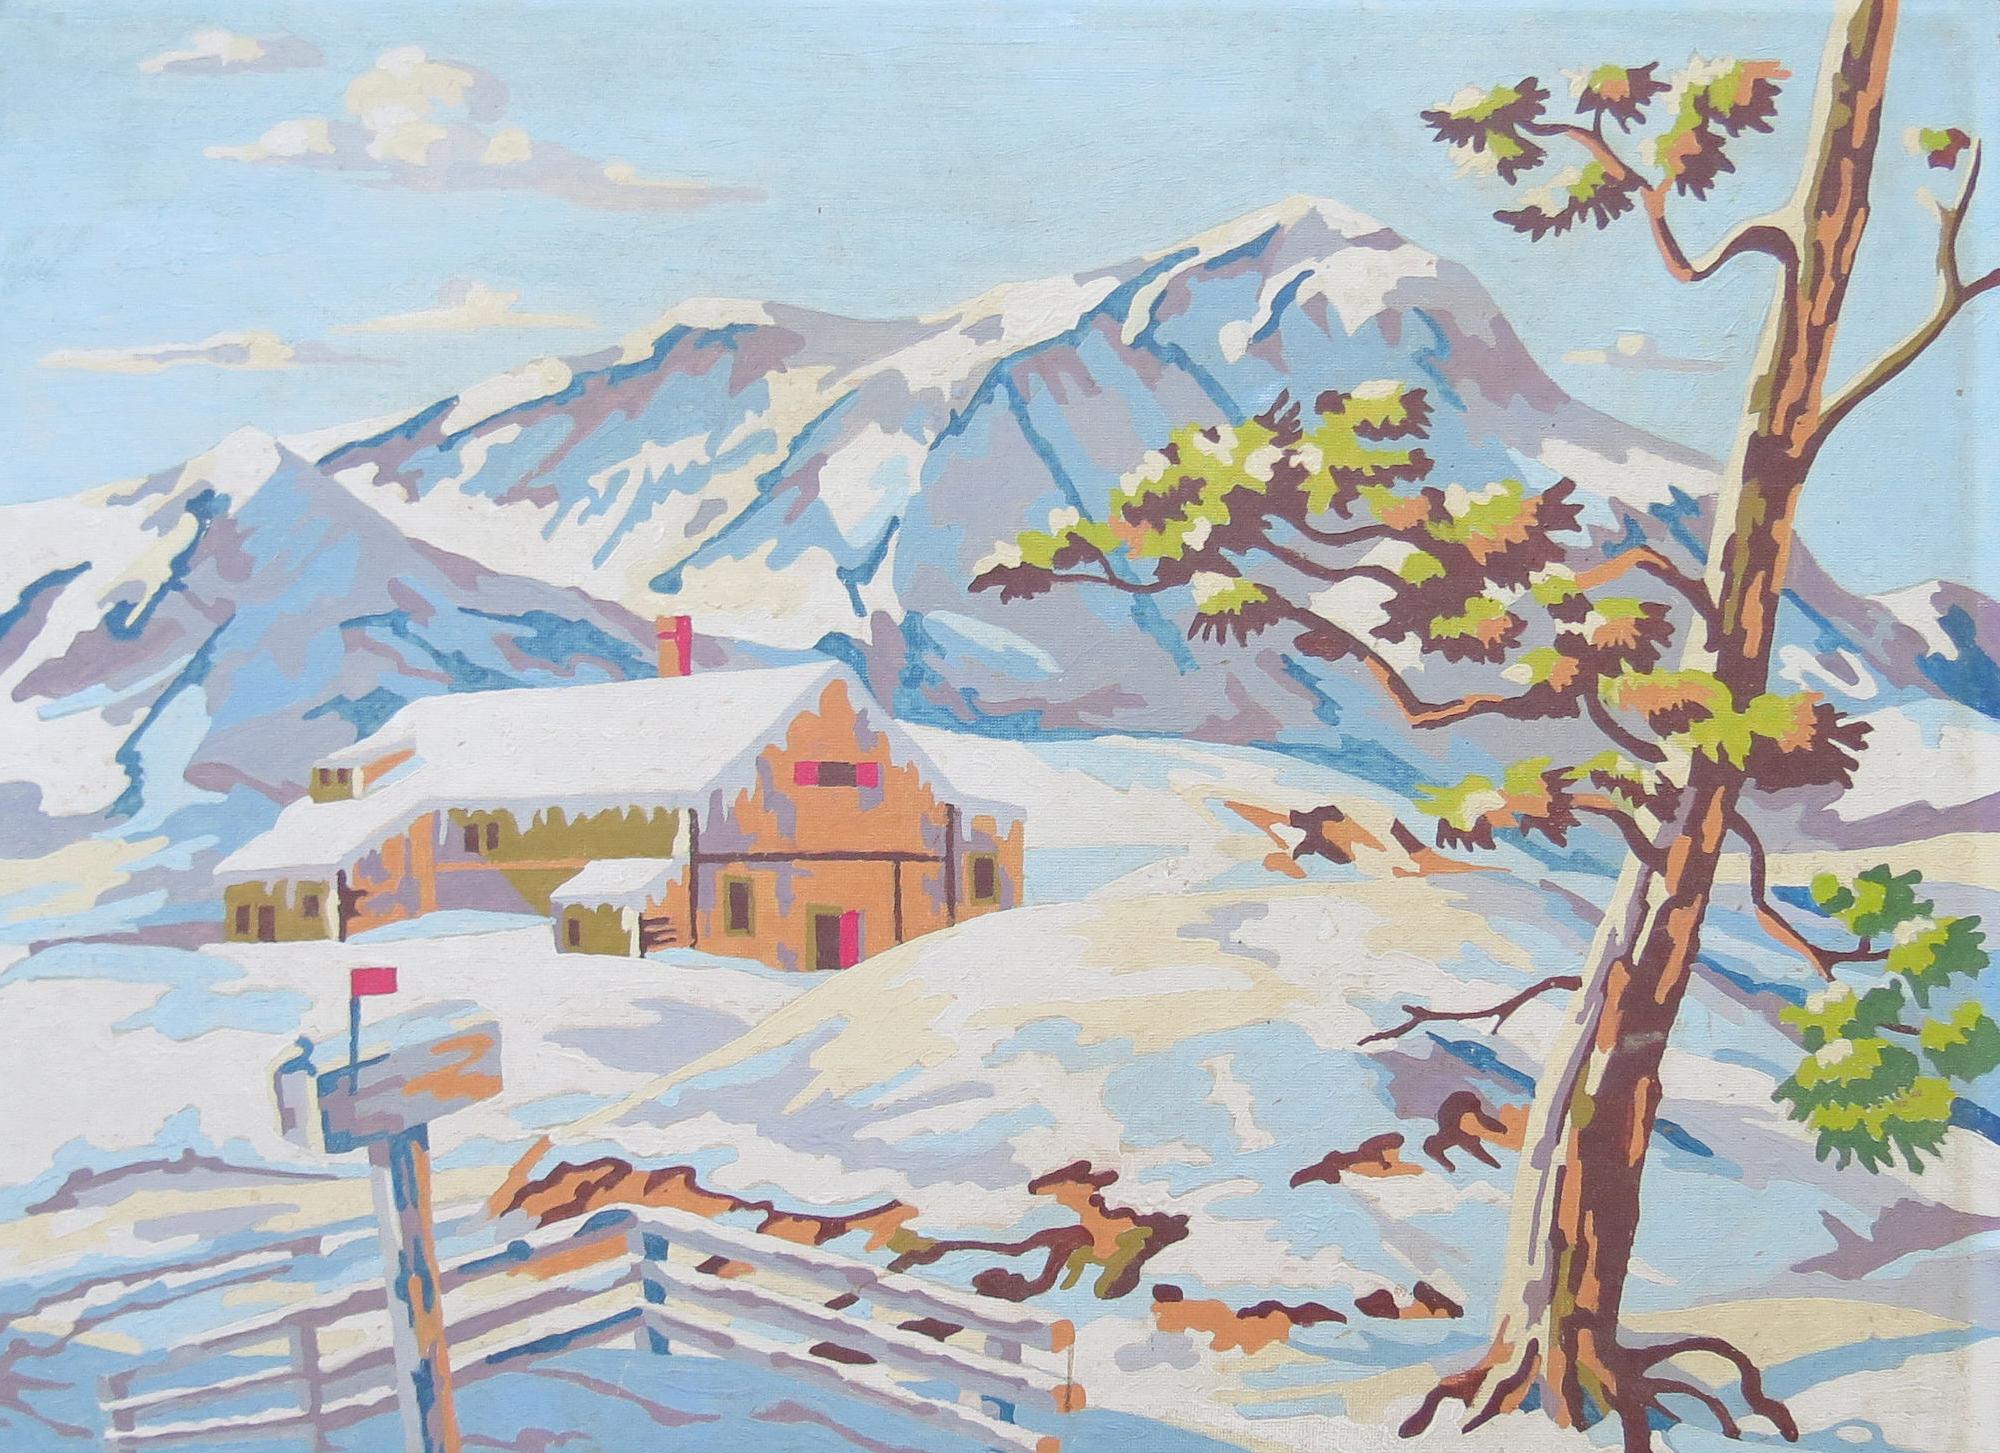 Paint By Number Winter Scene // Vintage Retro Amateur Art Forest Mountain Landscape Rustic Cottage Decor Colorful Collectible Affordable Art